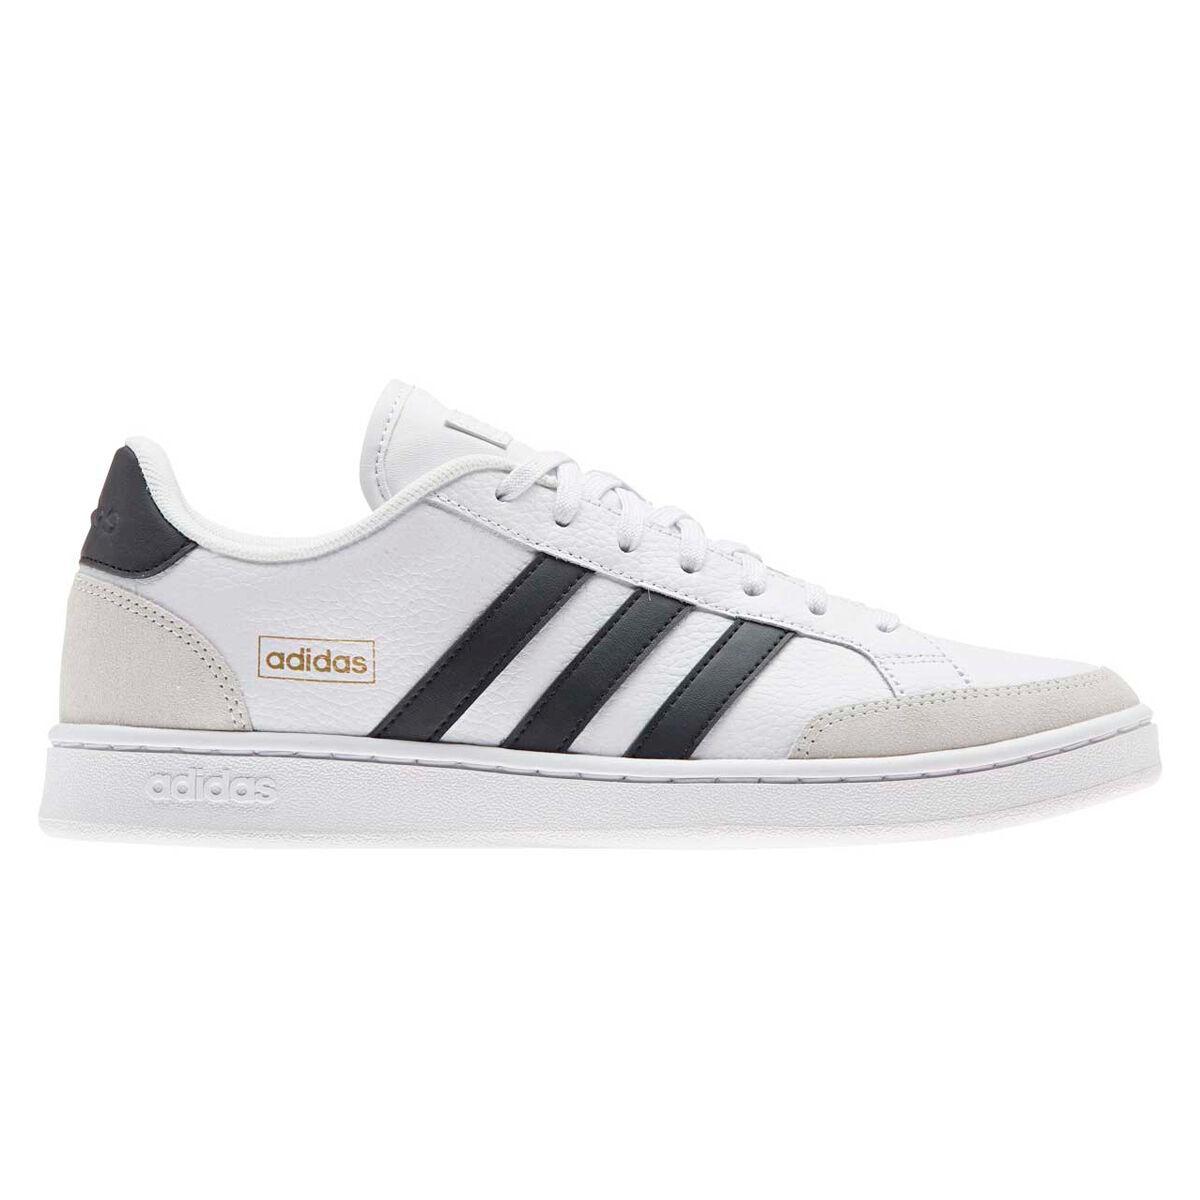 adidas Grand Court SE Mens Casual Shoes